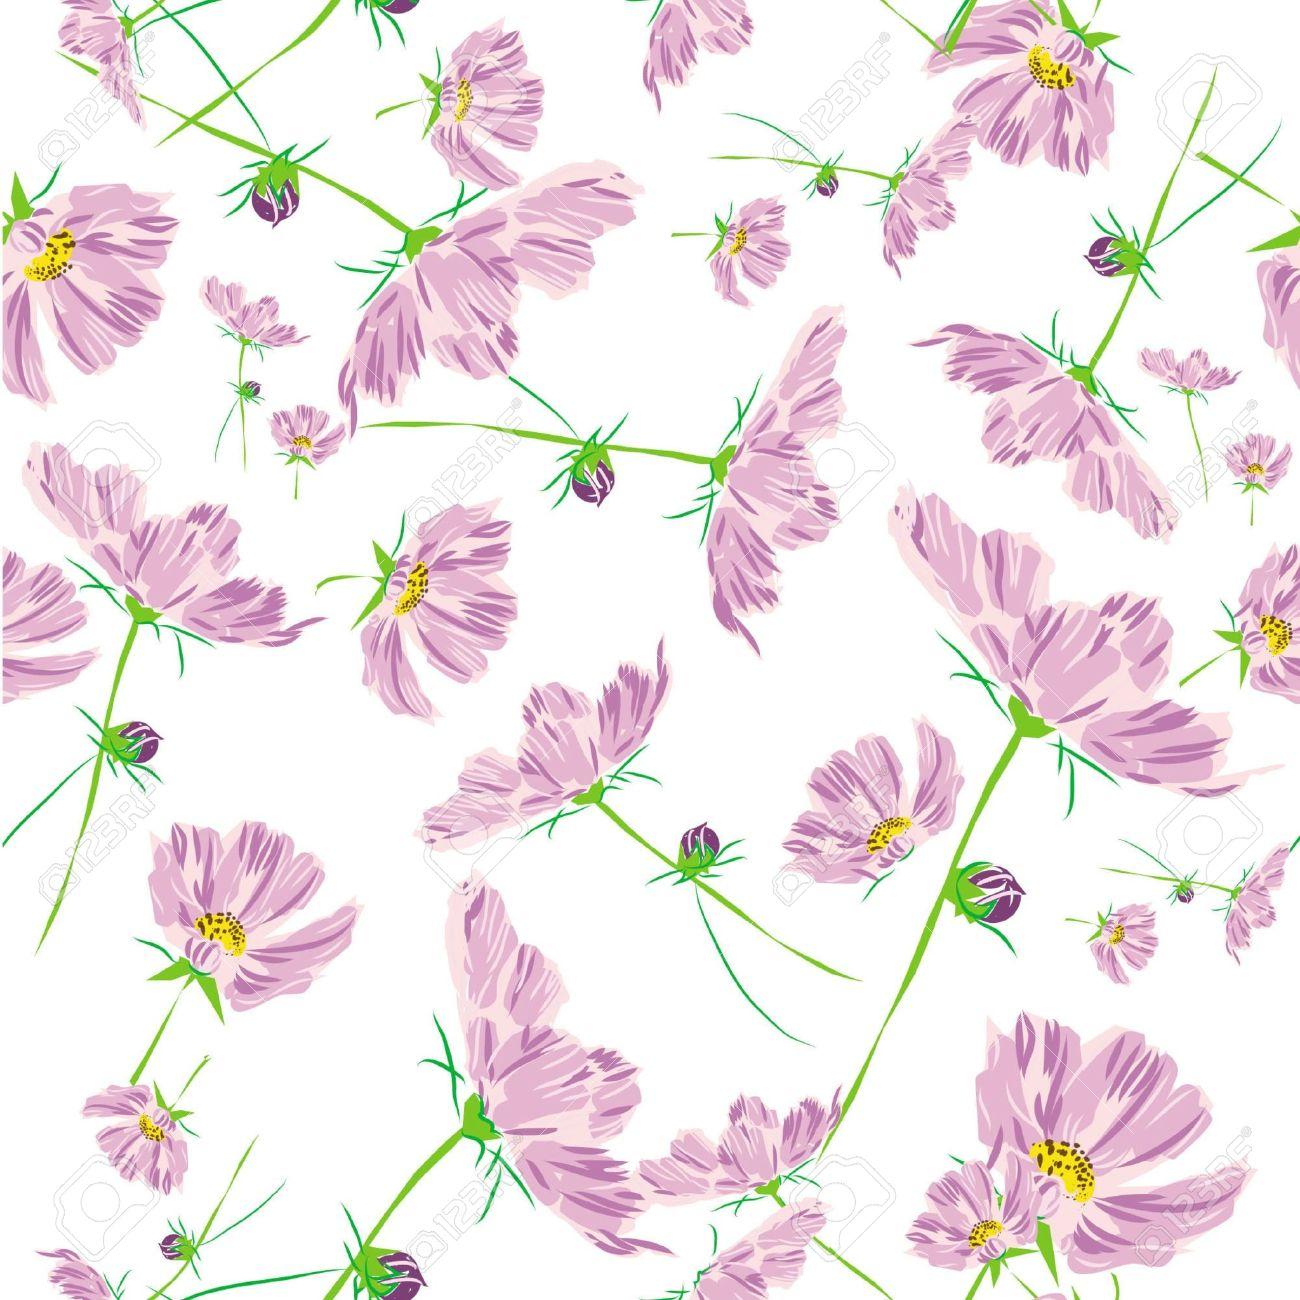 Rosa Cosmos Patrón De Flores Aisladas Sobre Fondo Blanco